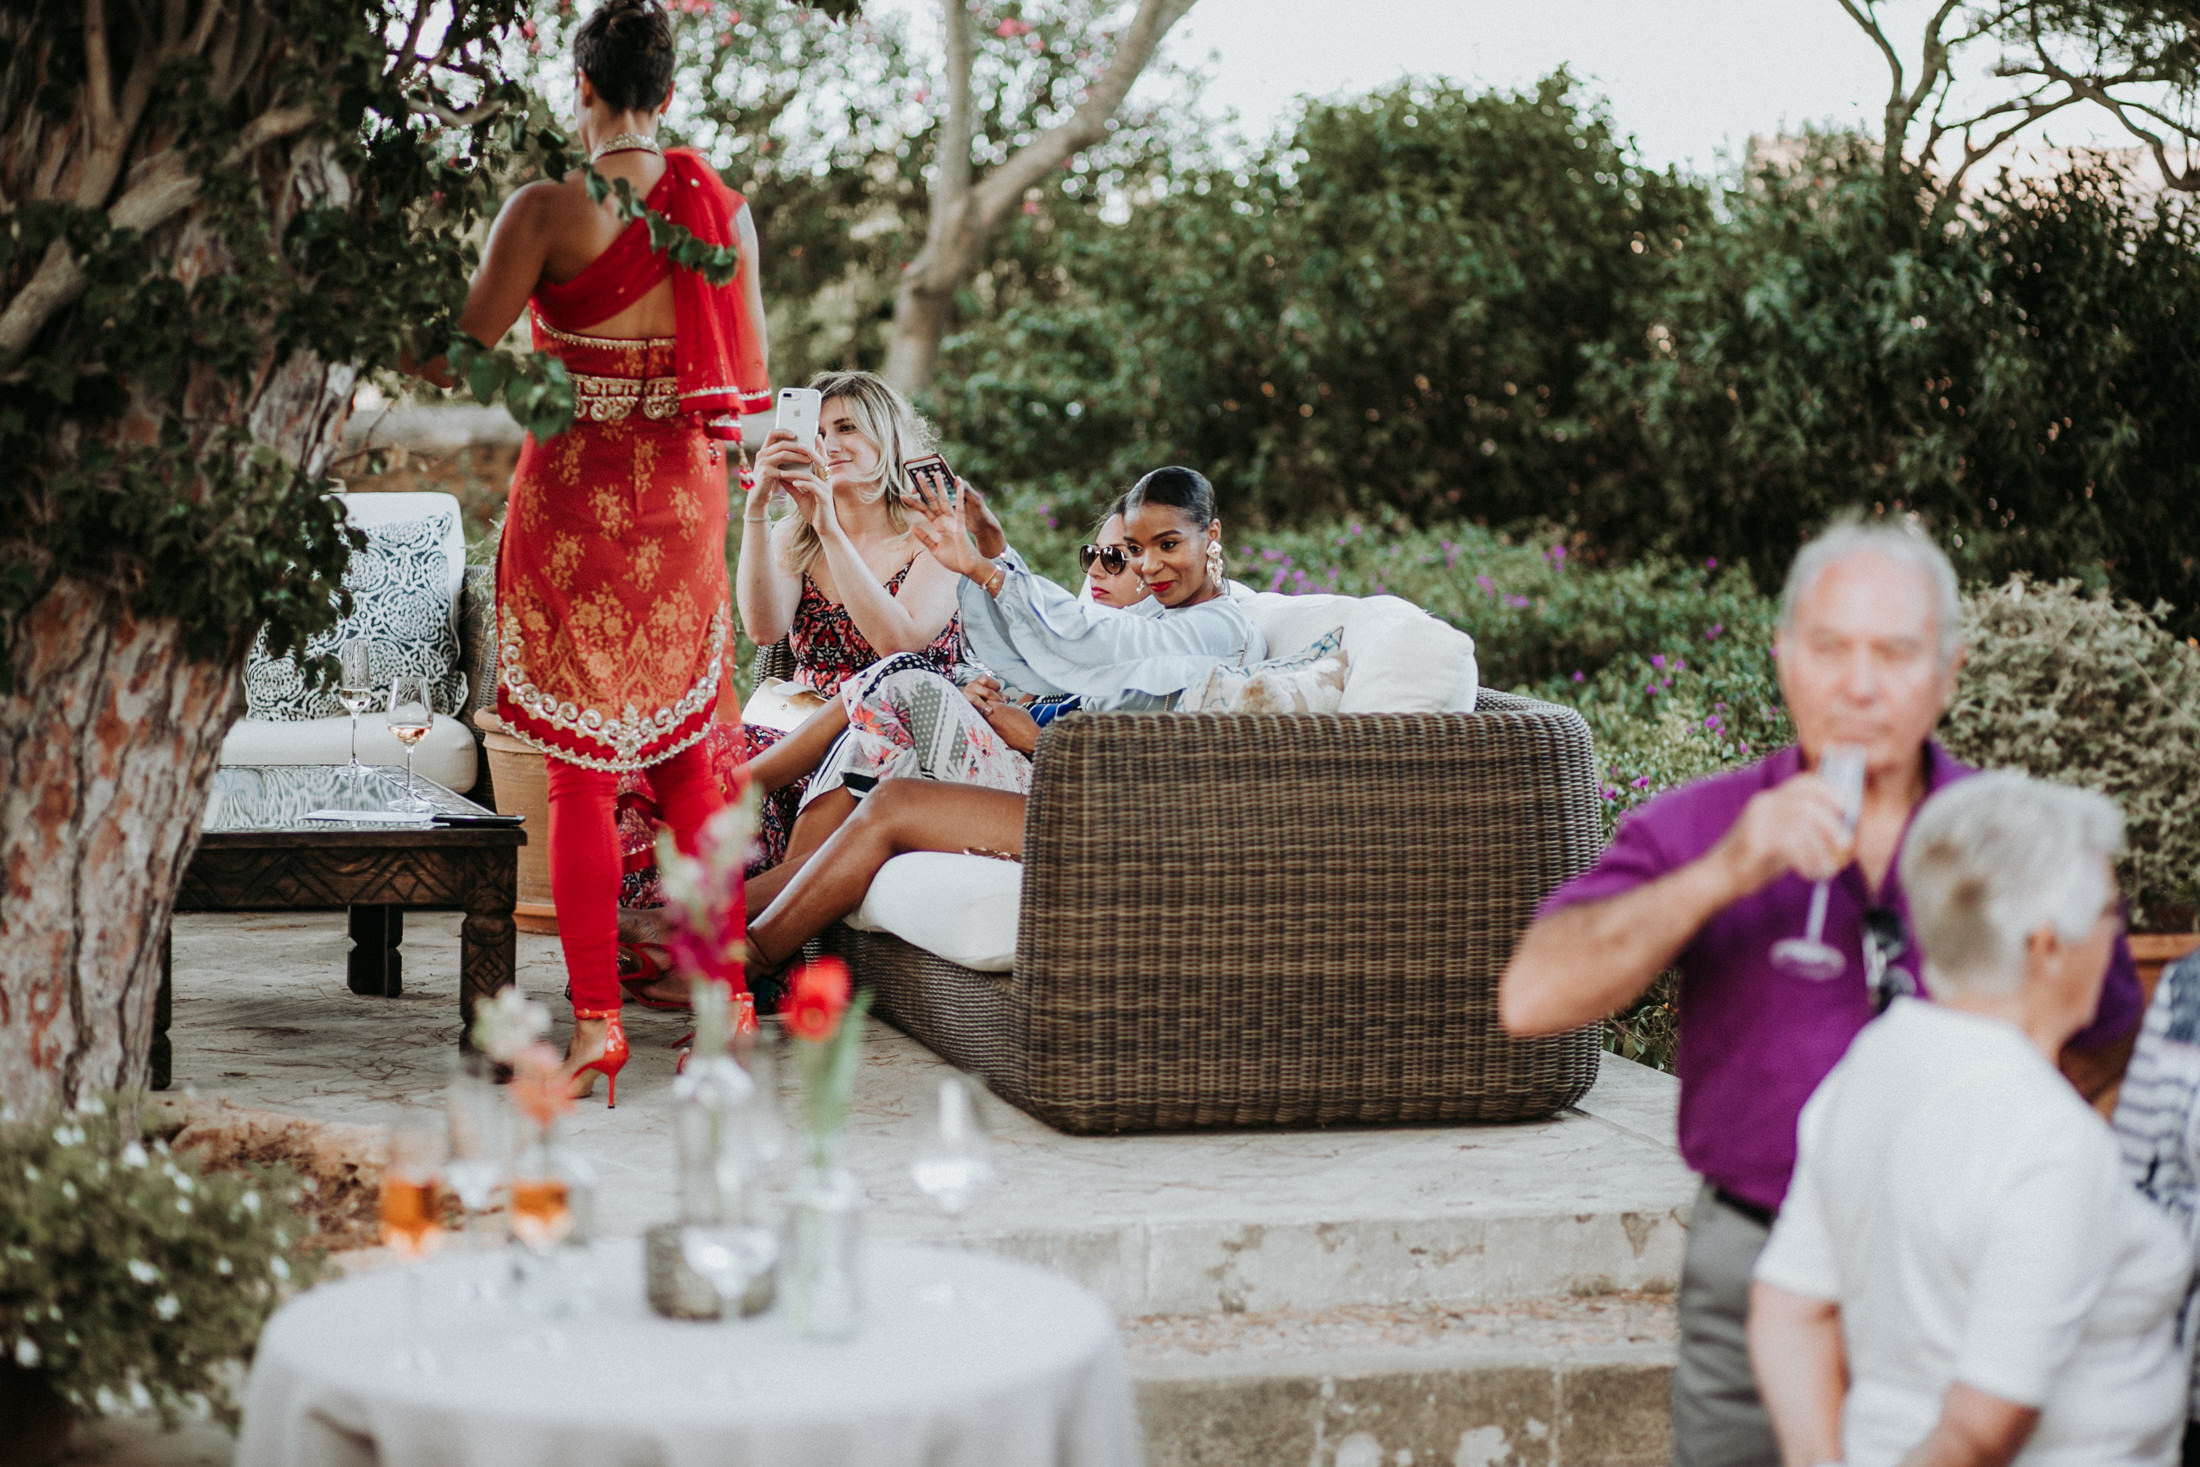 Wedding_Photographer_Mallorca_Daniela-Marquardt_Photography_New_York_Iceland_Tuscany_Santorini_Portugal_Austria_Bavaria_Elopement_Hochzeitsfotograf_AntjeRajat1_43